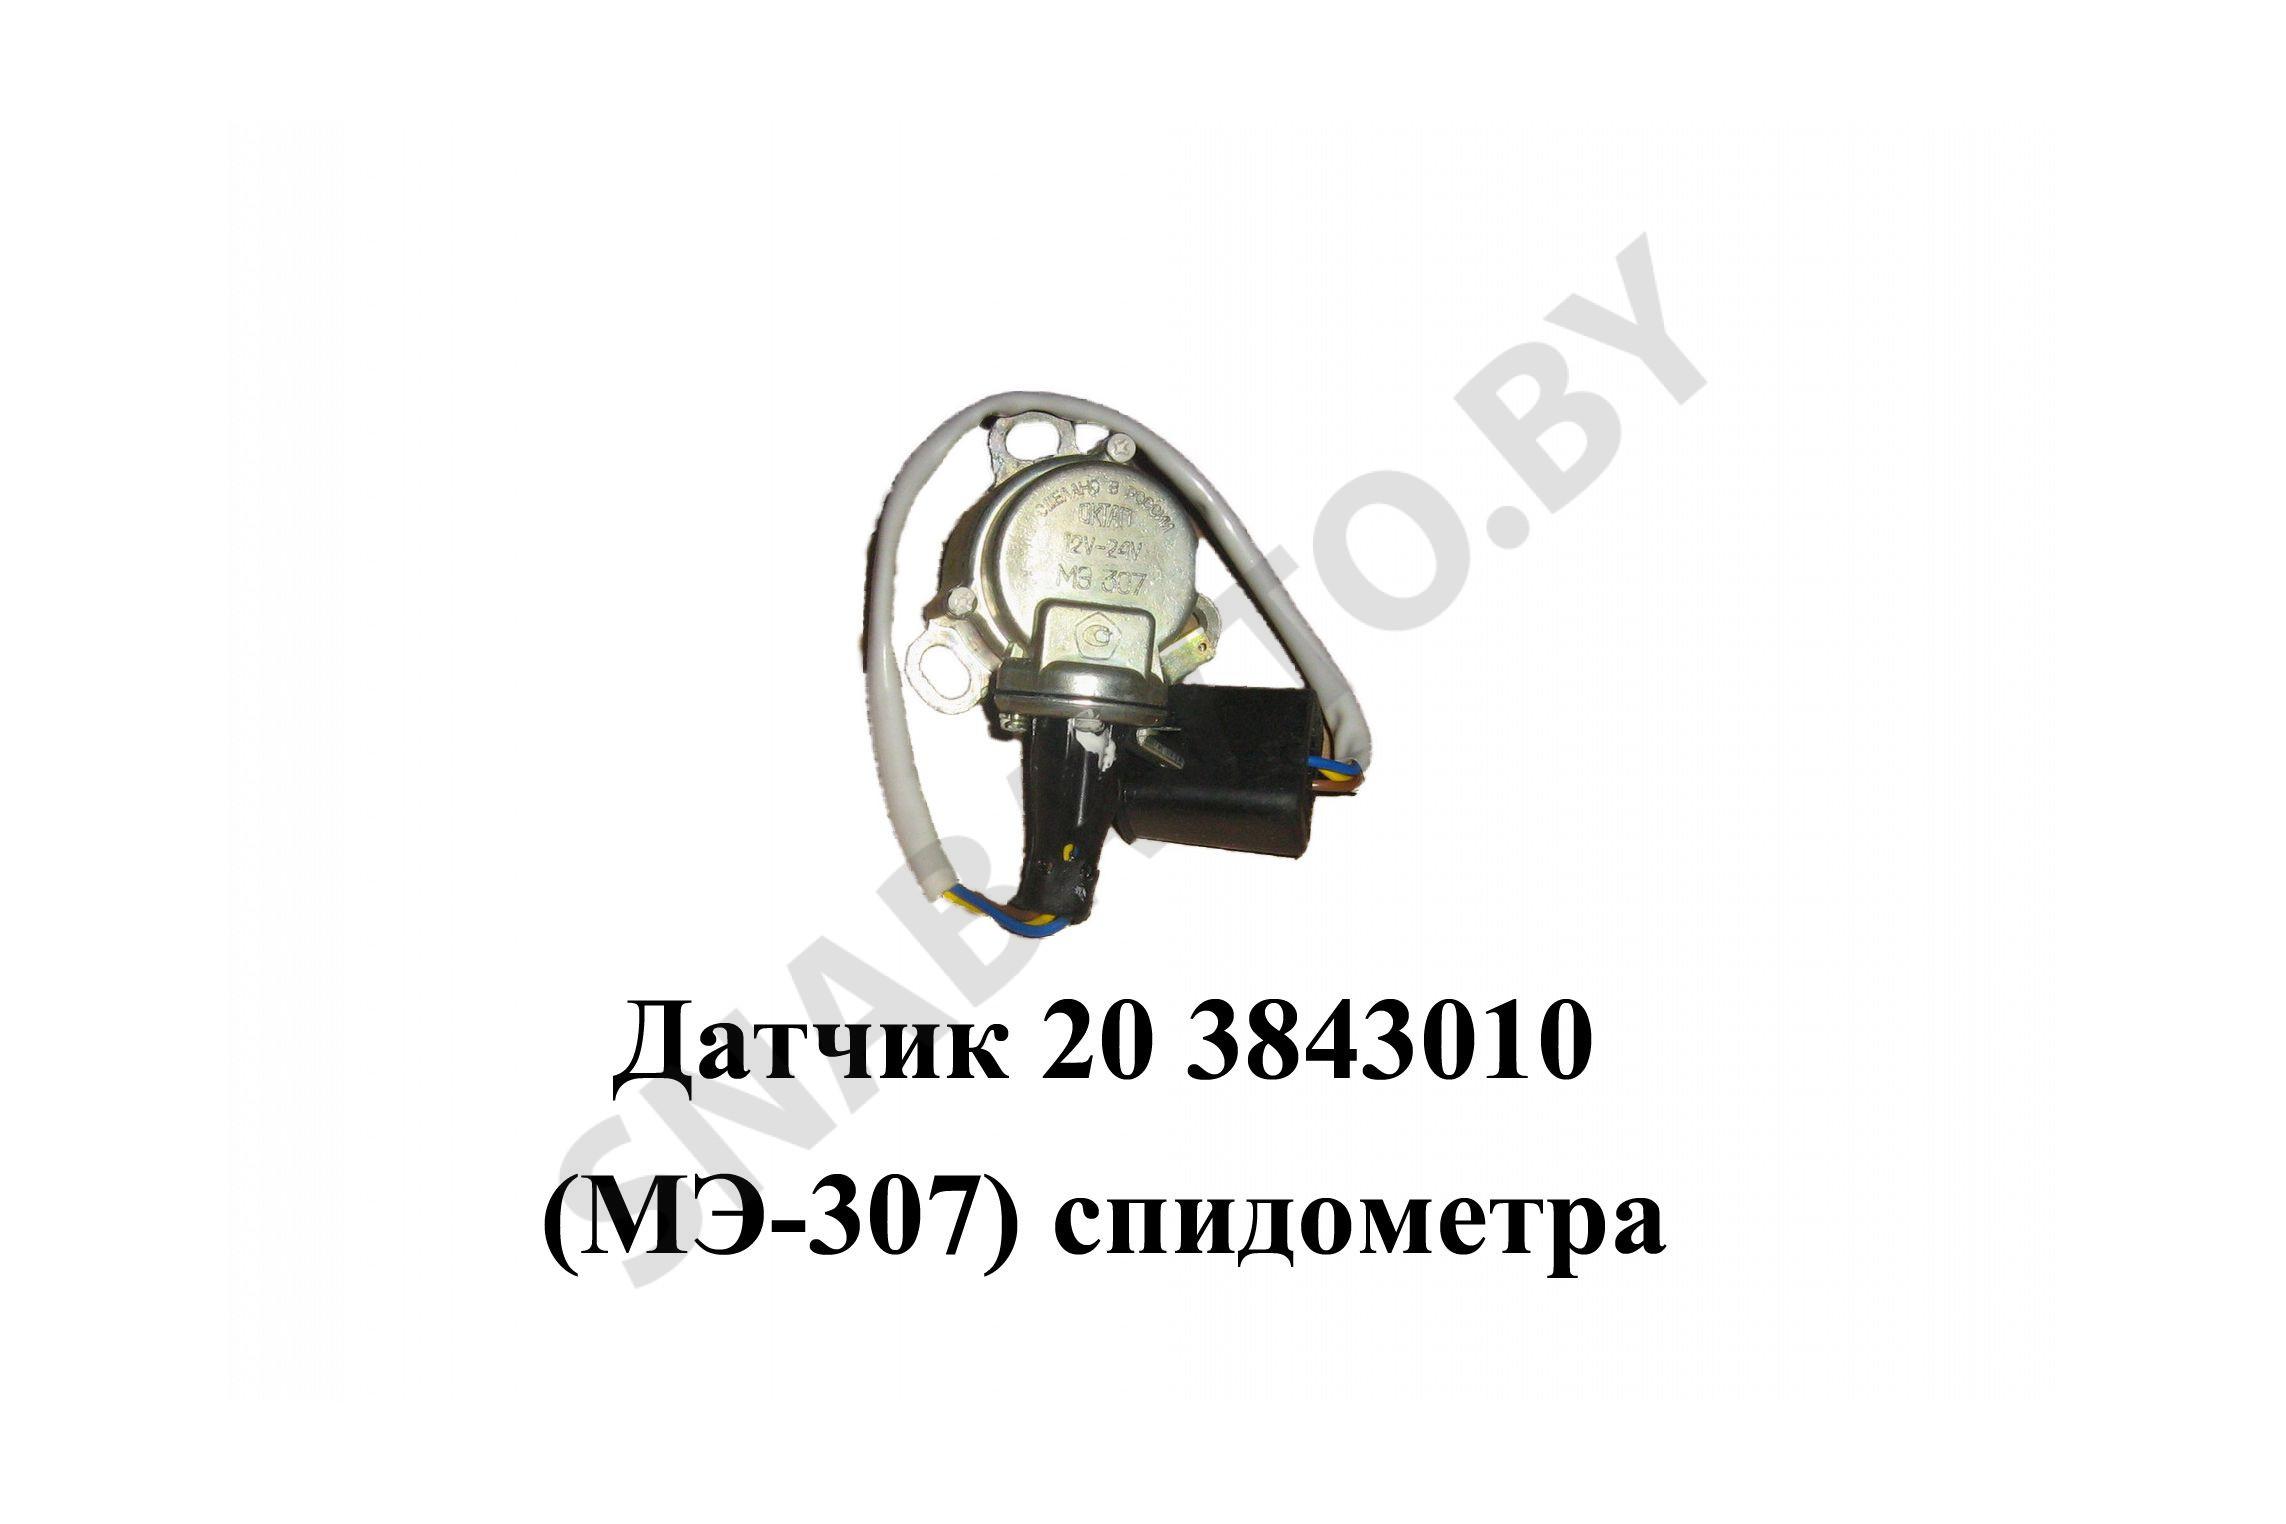 Датчик (МЭ-307) спидометра